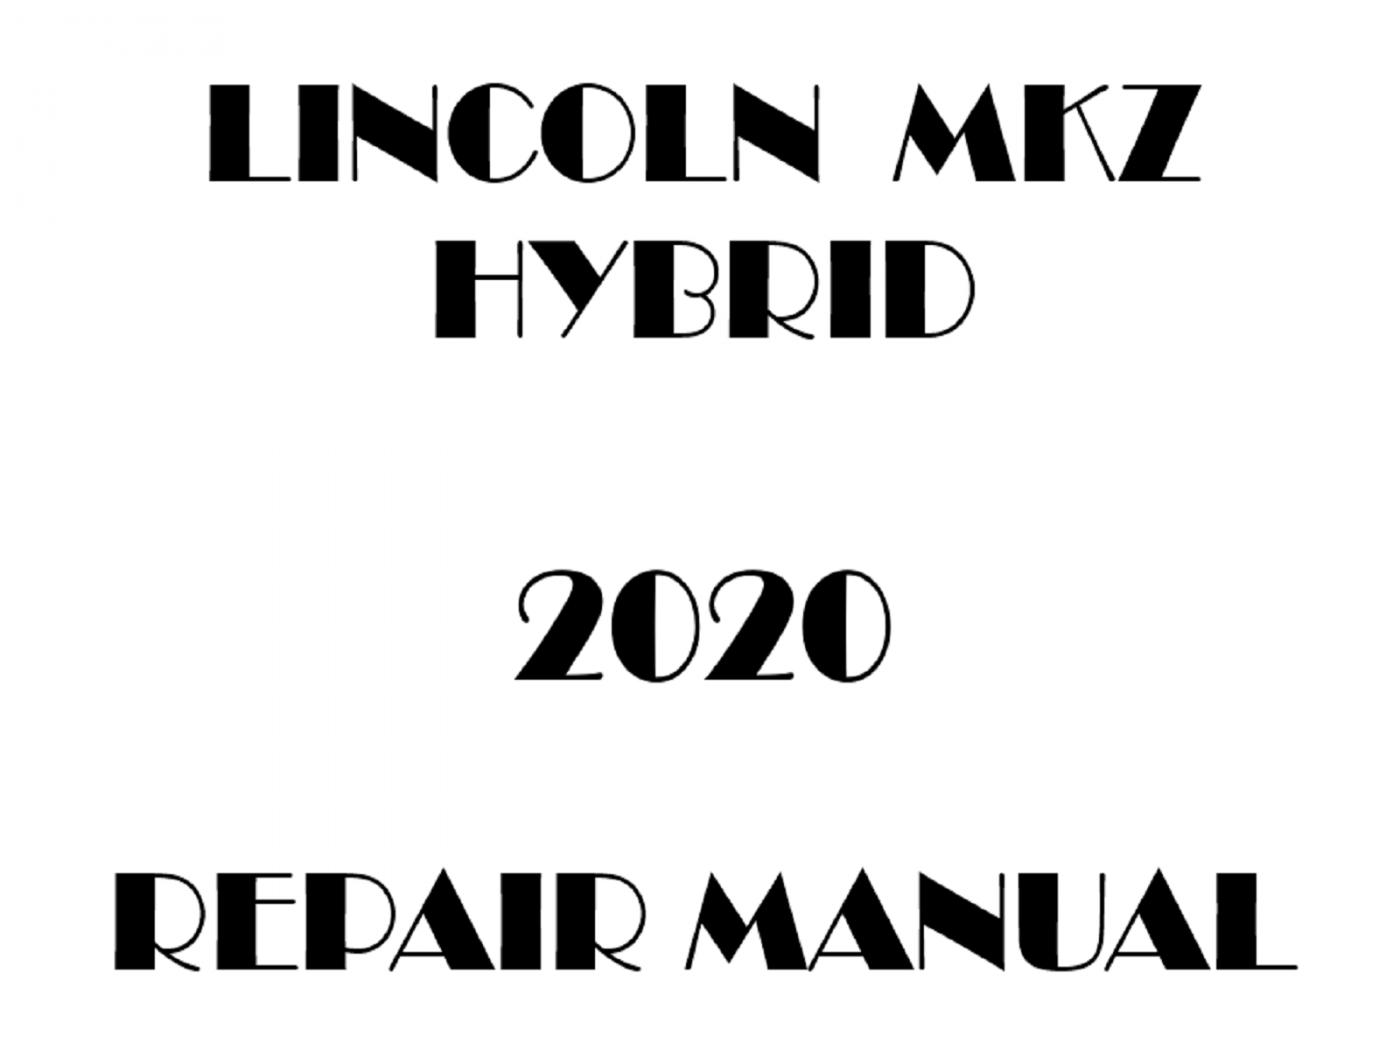 2020 Lincoln MKZ Hybrid repair manual